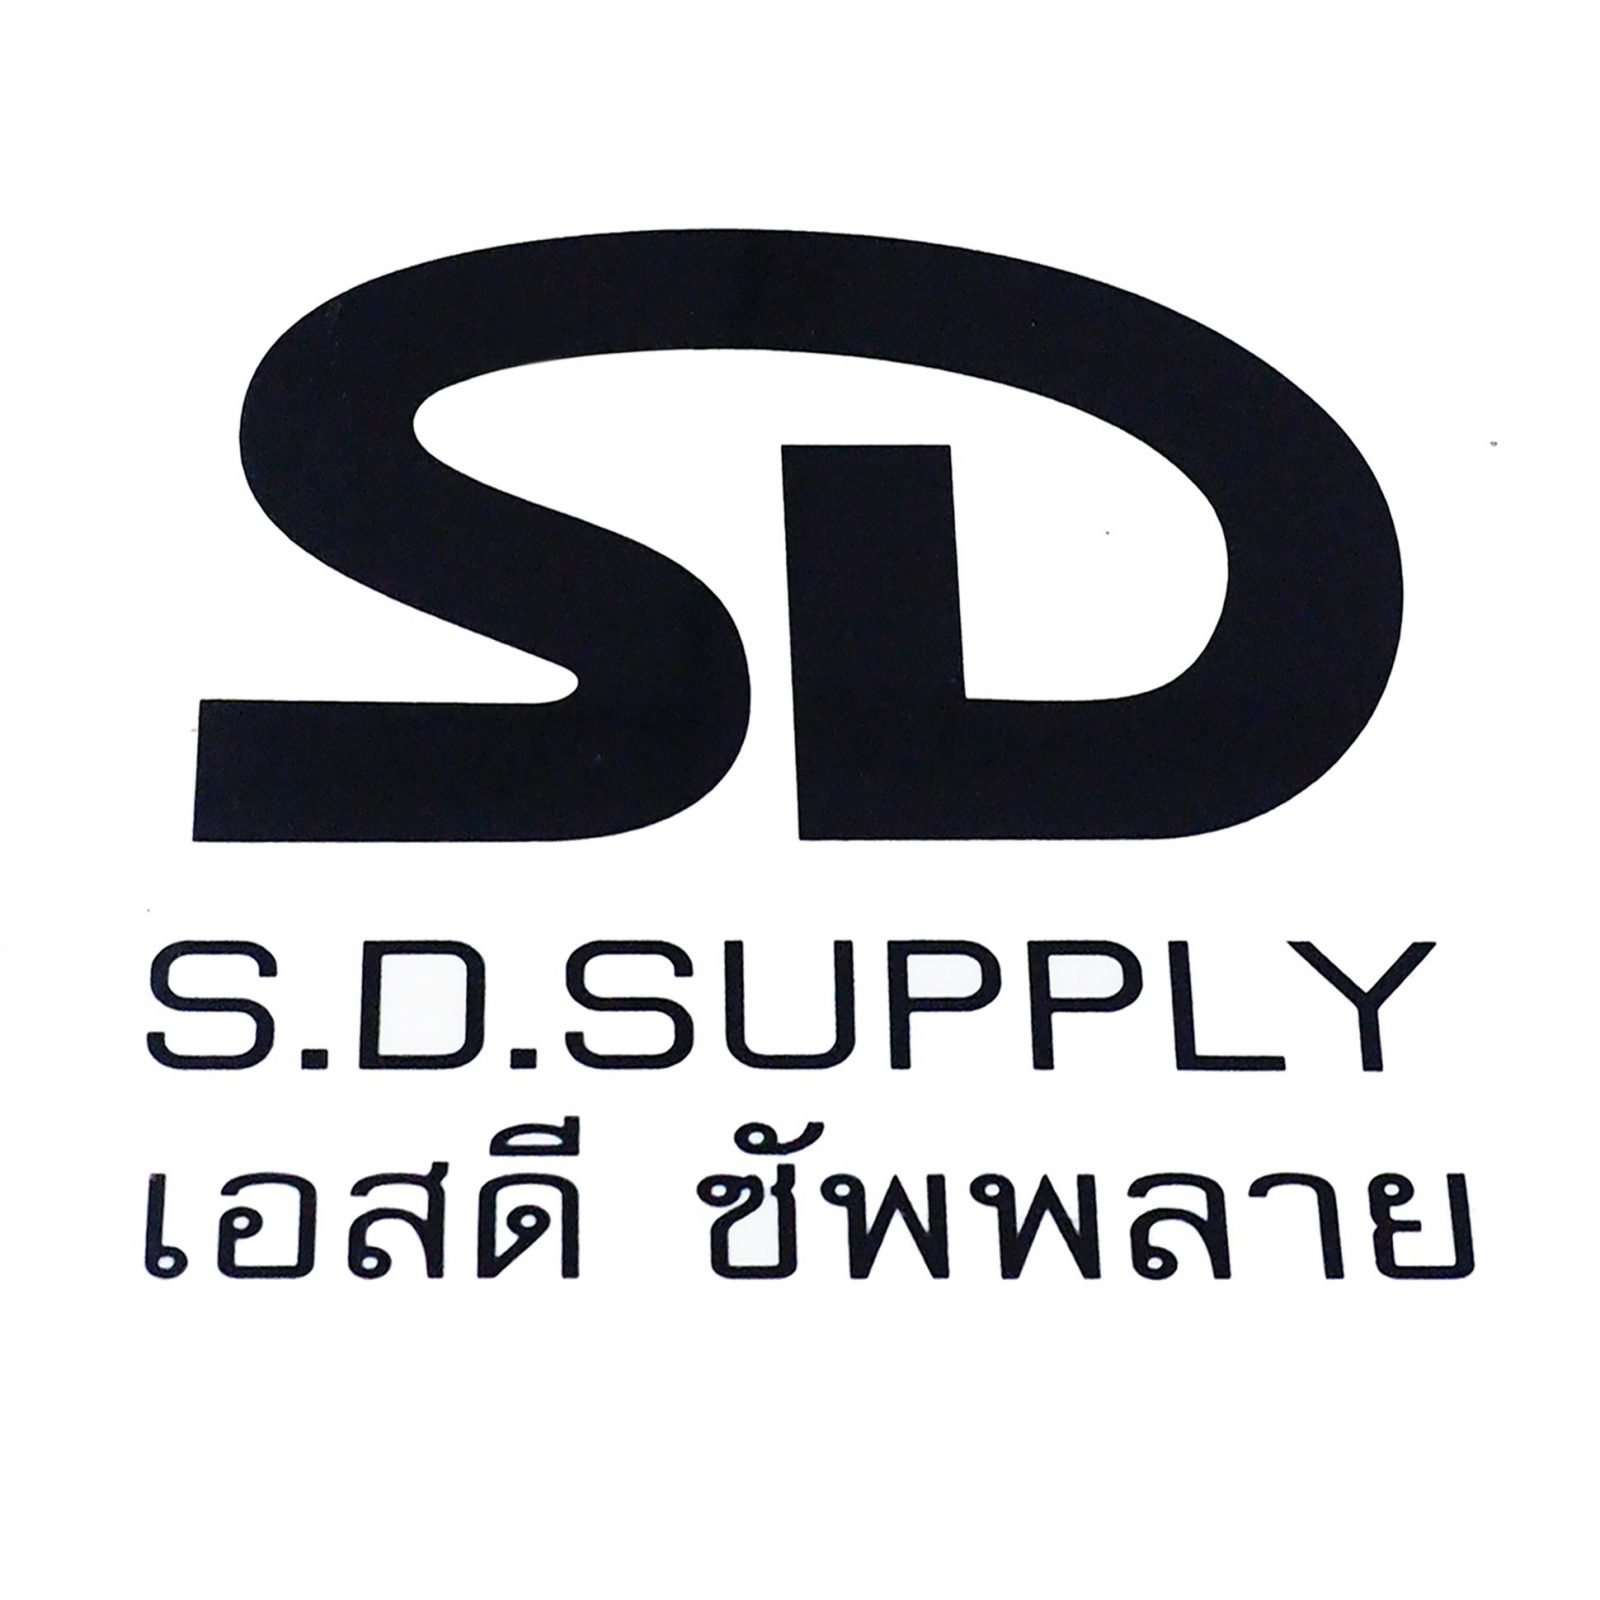 S.D.SUPPLY เครื่องมือช่าง